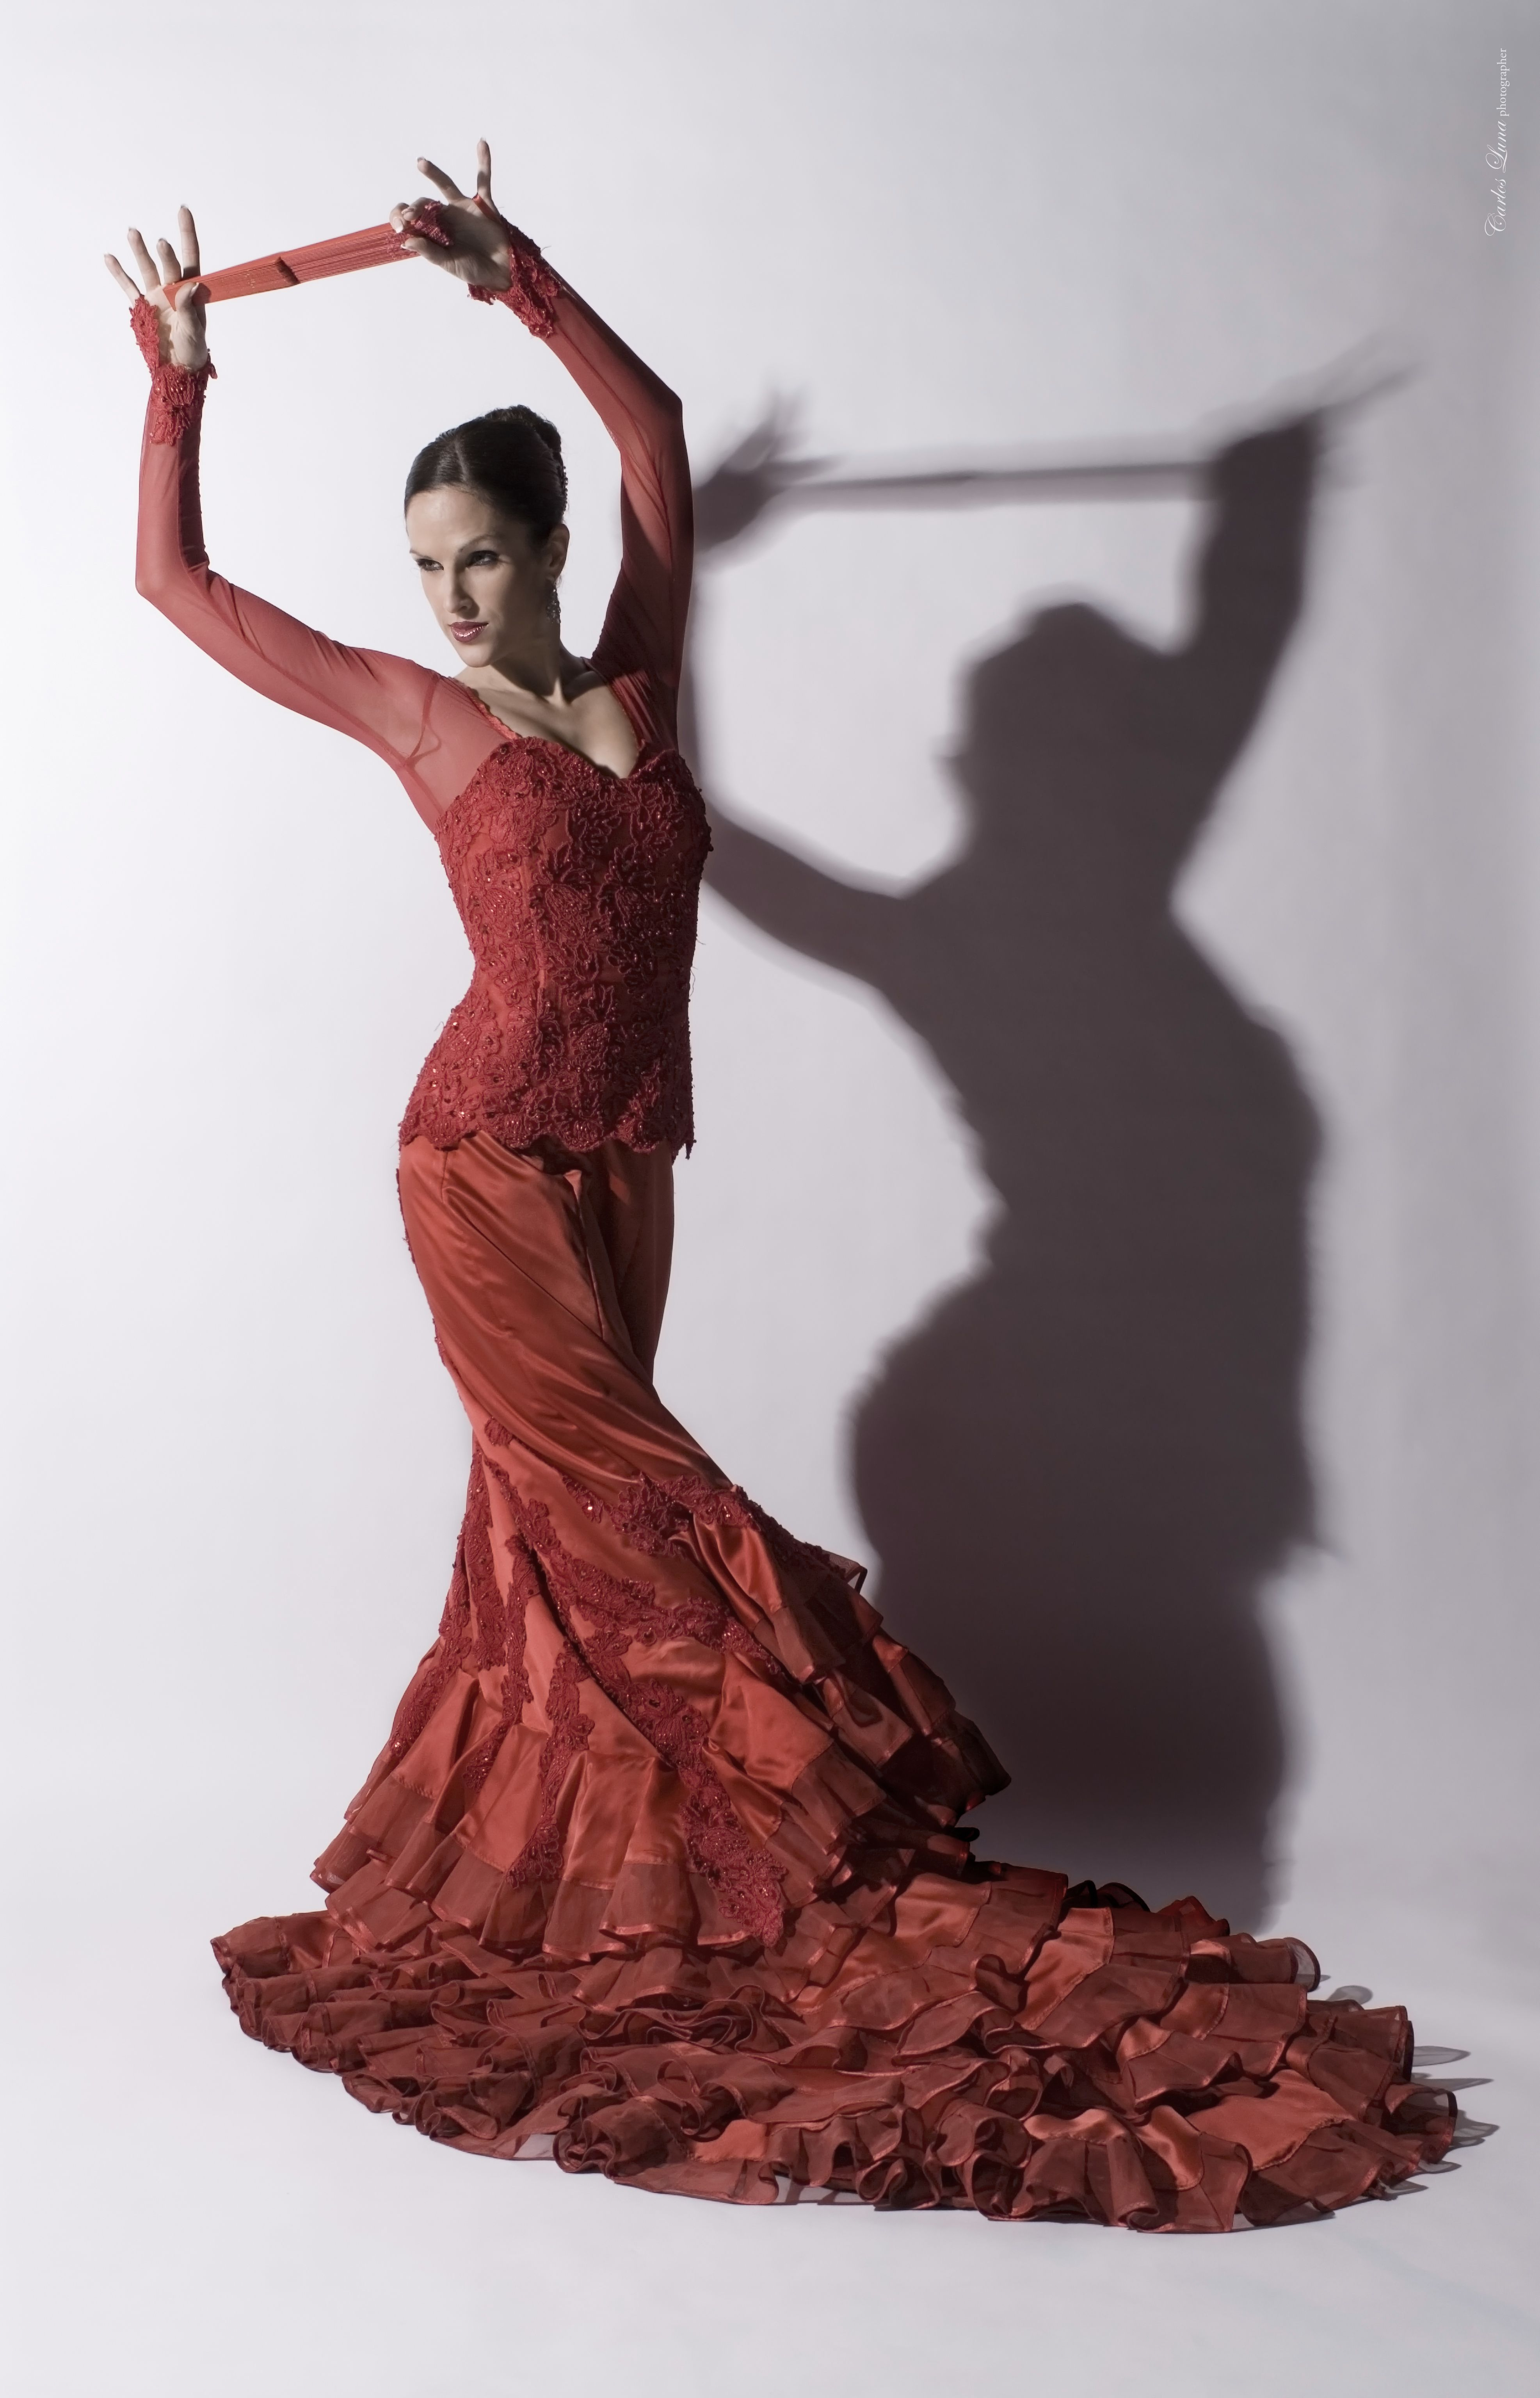 cdd049a2bc4c Flamenco Dress: Red Lace Carlos Luna's photo of dancer Maria Vega, via  www.mariavega.eu